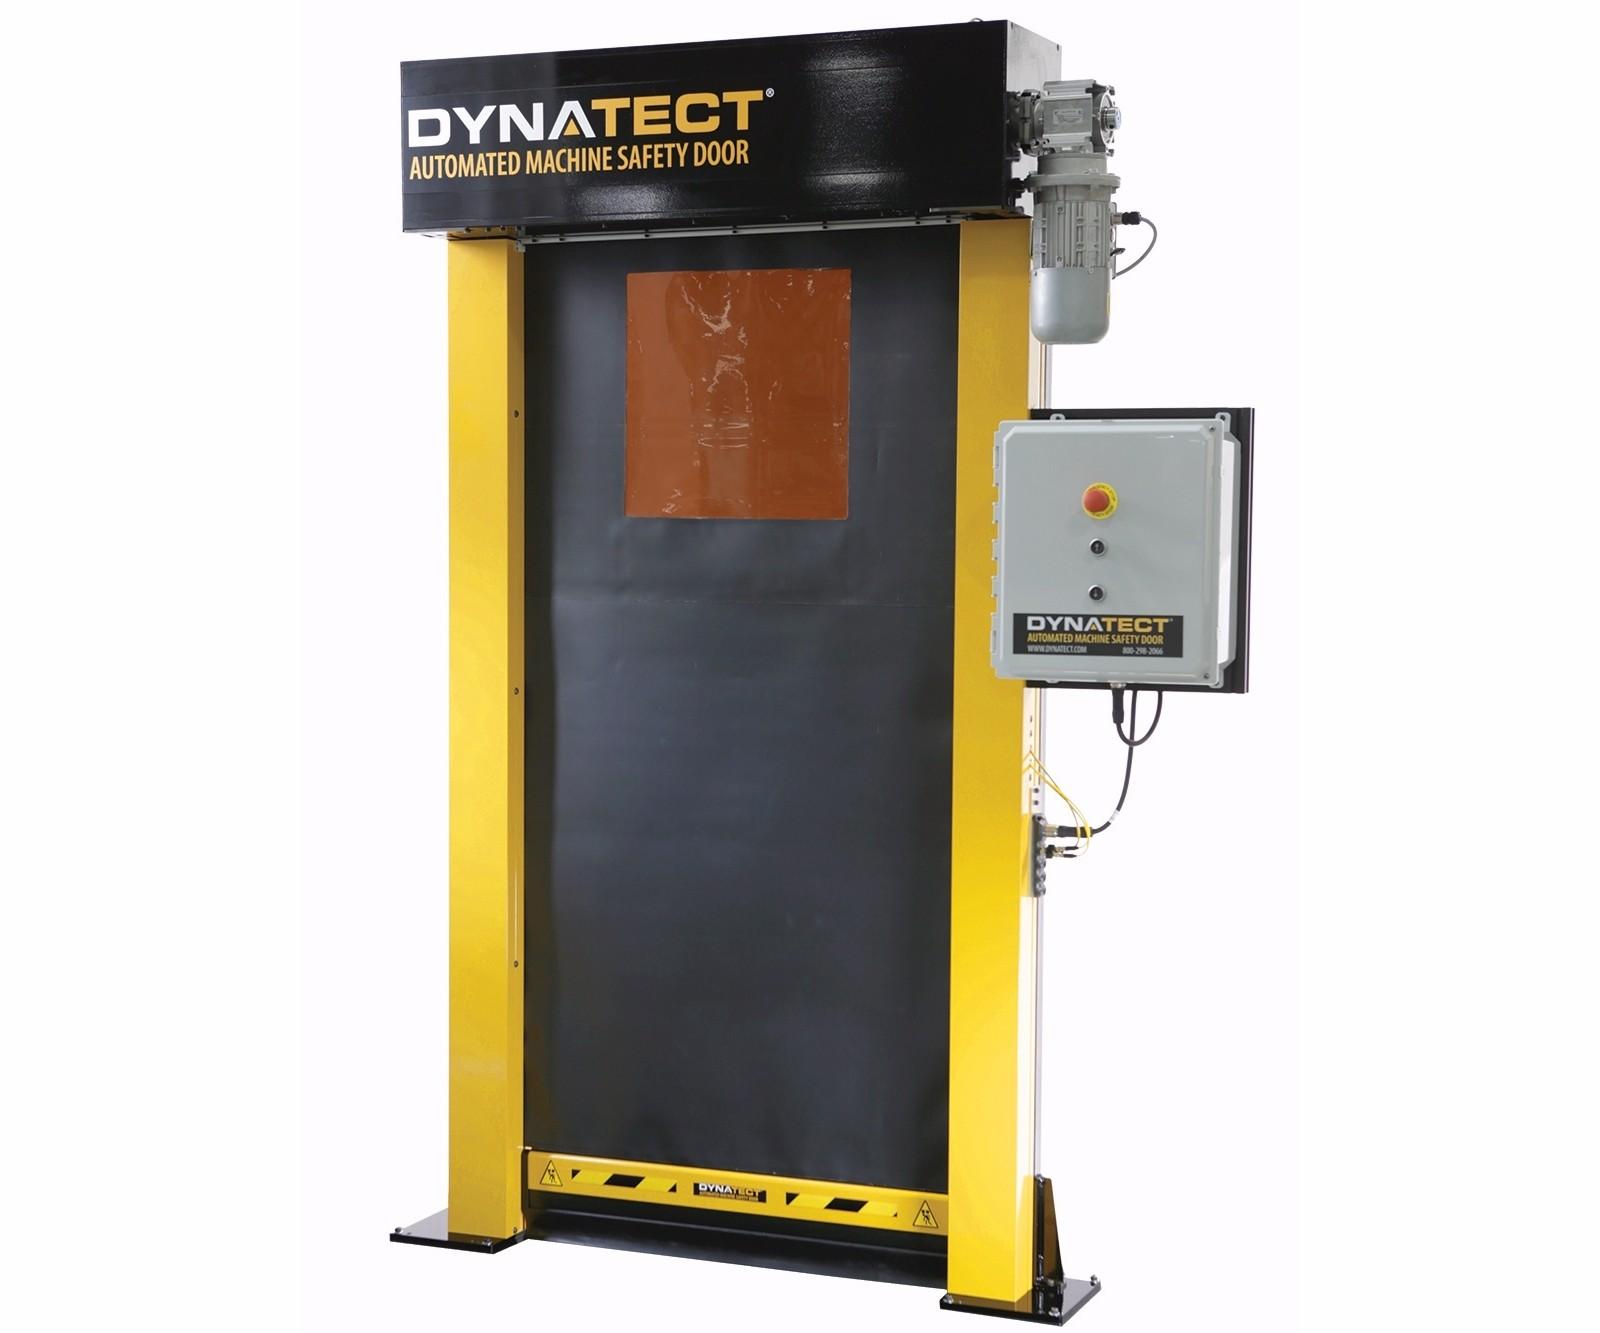 Automated machine safety door  sc 1 st  Modern Machine Shop & Dynatect Manufacturing Inc. Showroom : Modern Machine Shop